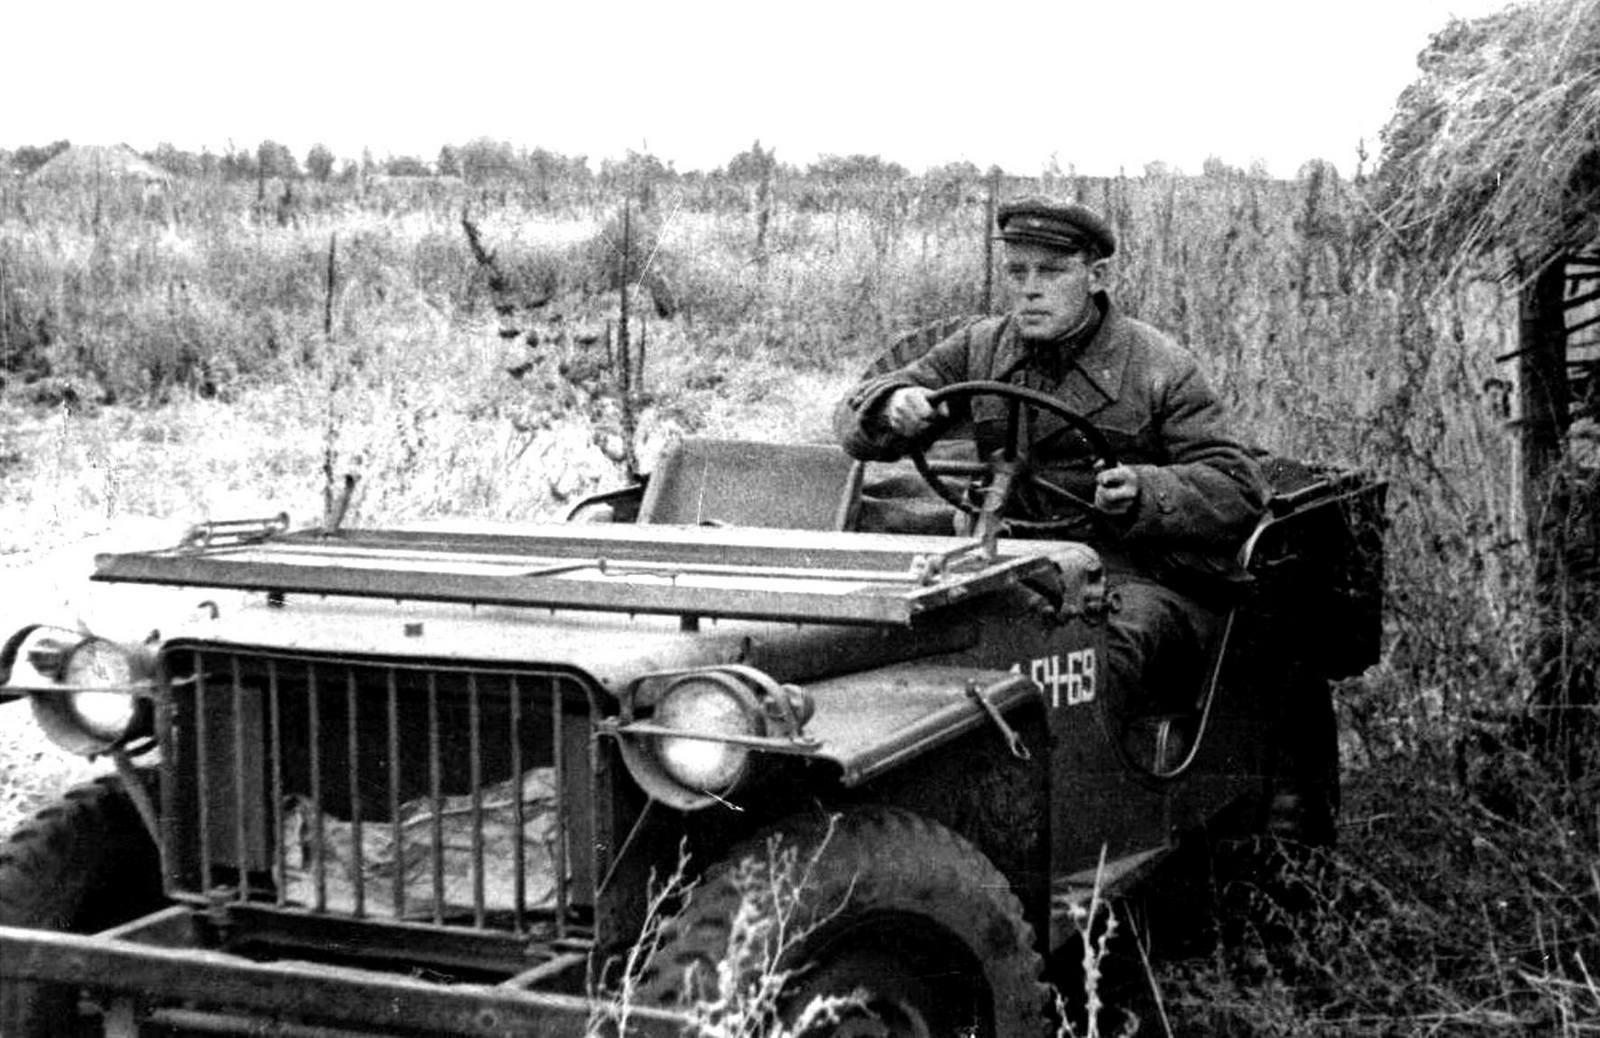 Джипы Виллис. История легенды (Евгений Хацкельсон) / Проза.ру